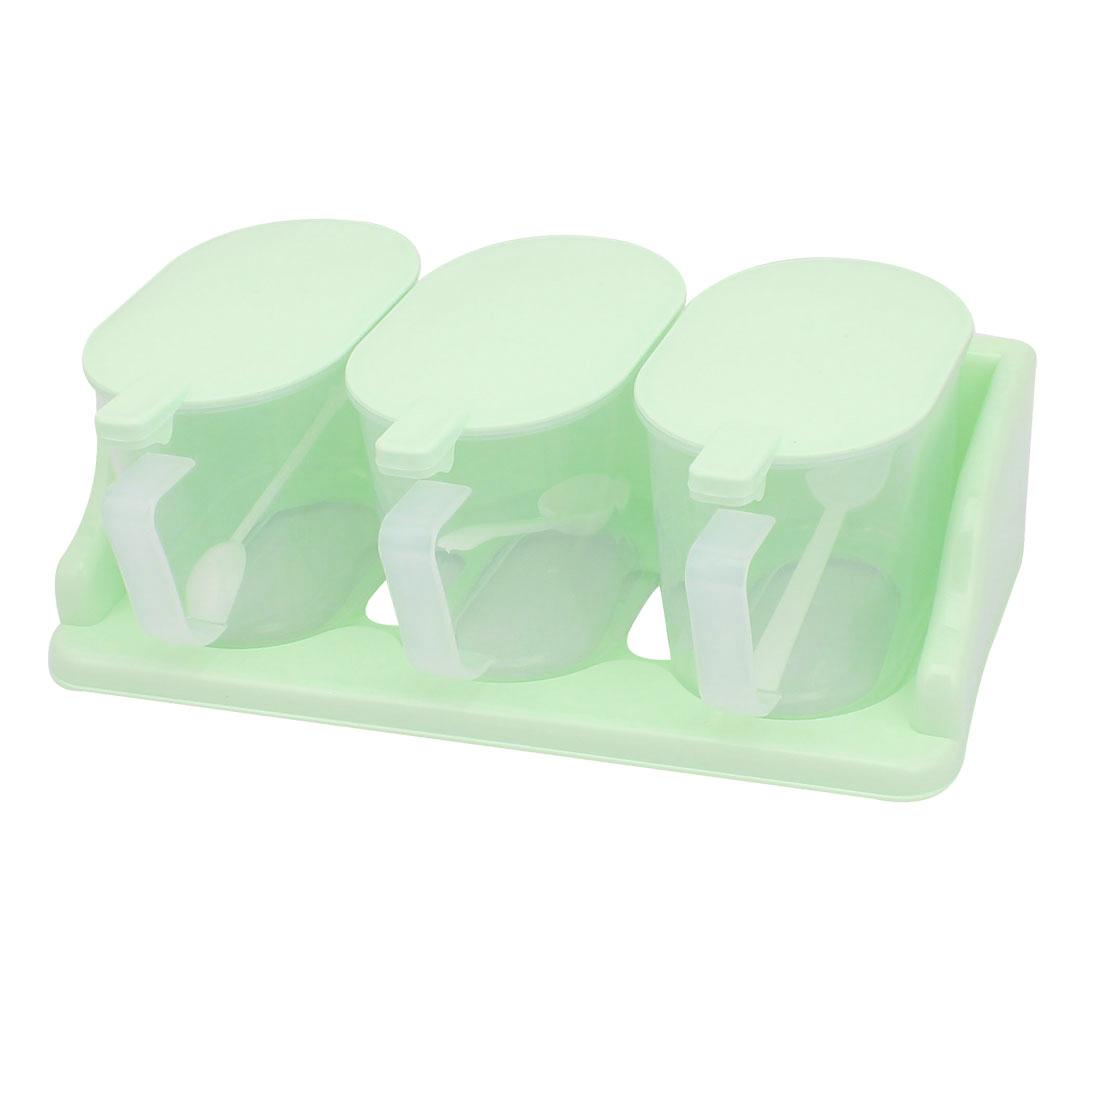 Kitchen Plastic 3 Sections Spices Salt Condiment Container Dispenser Case Green